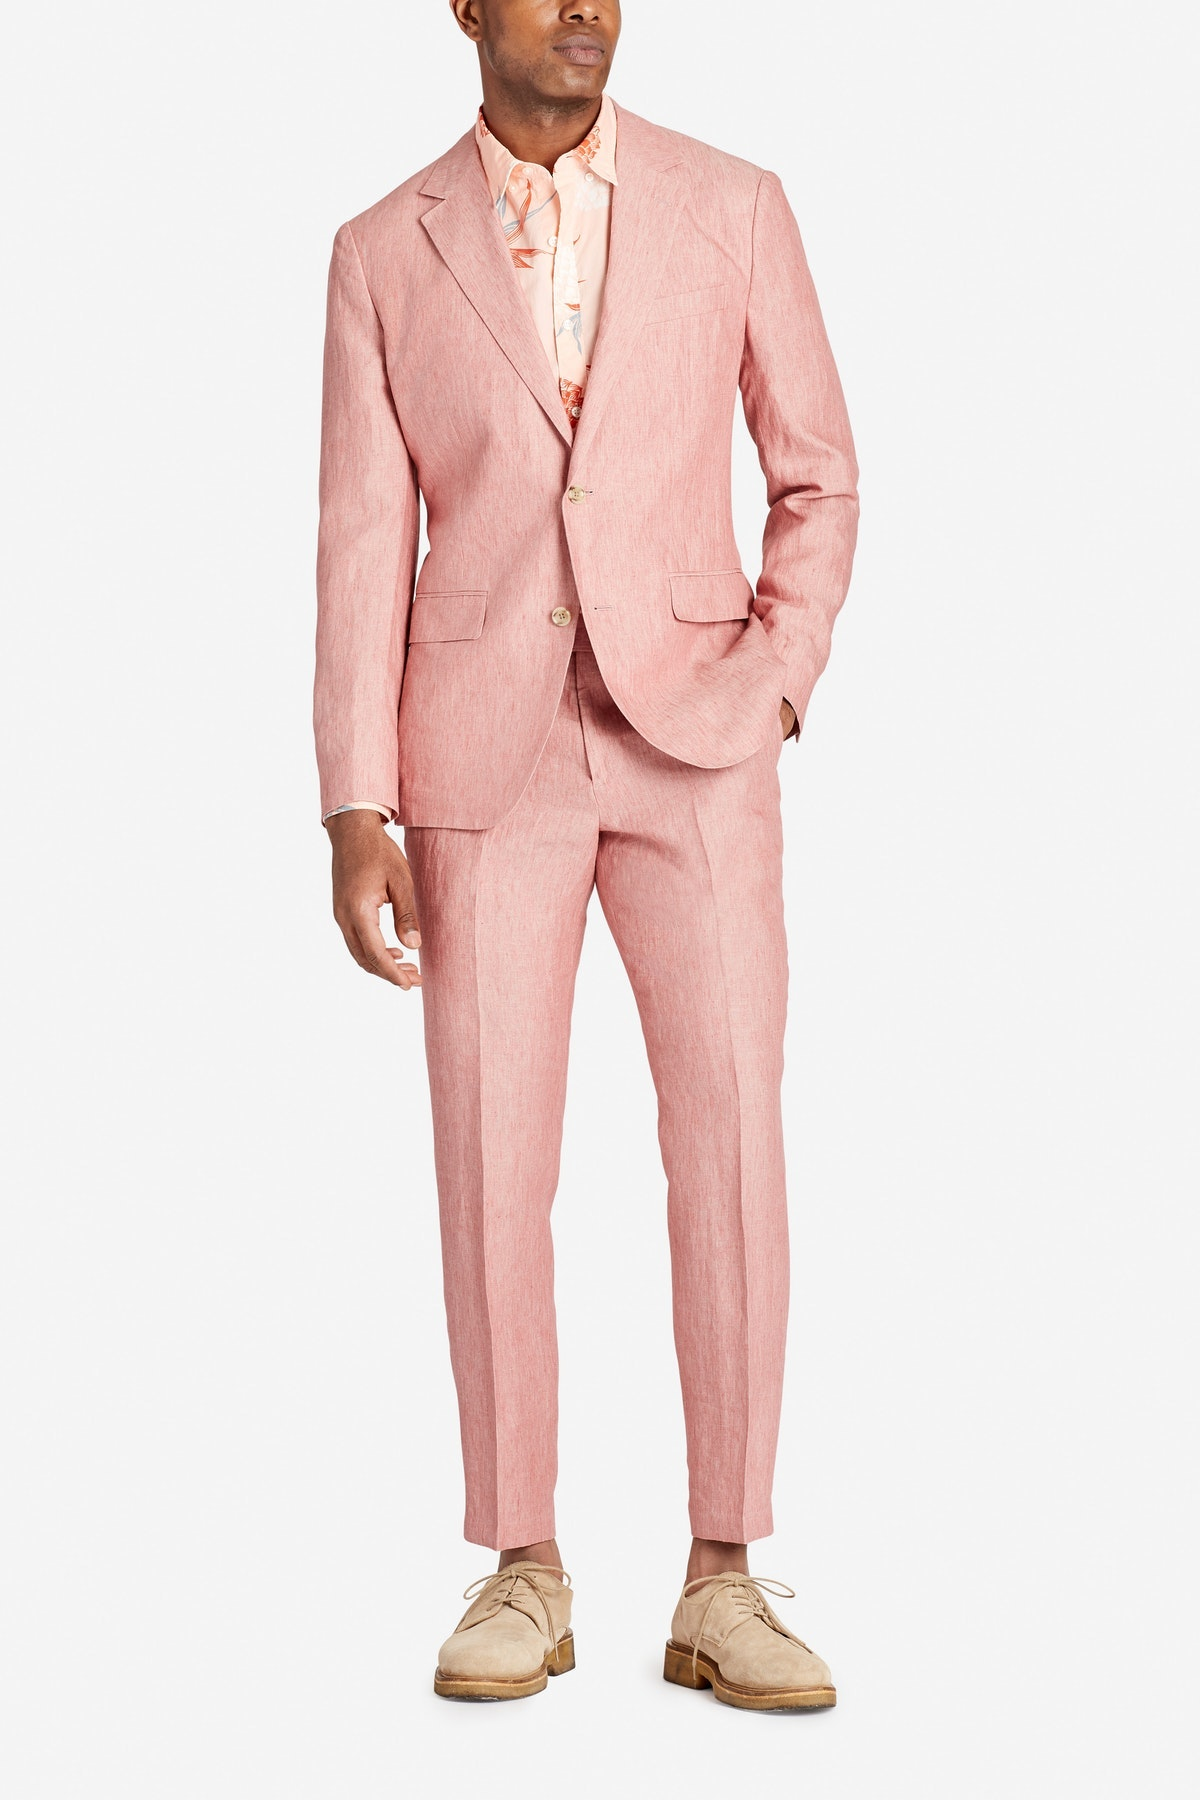 Lightweight Italian Linen Suit